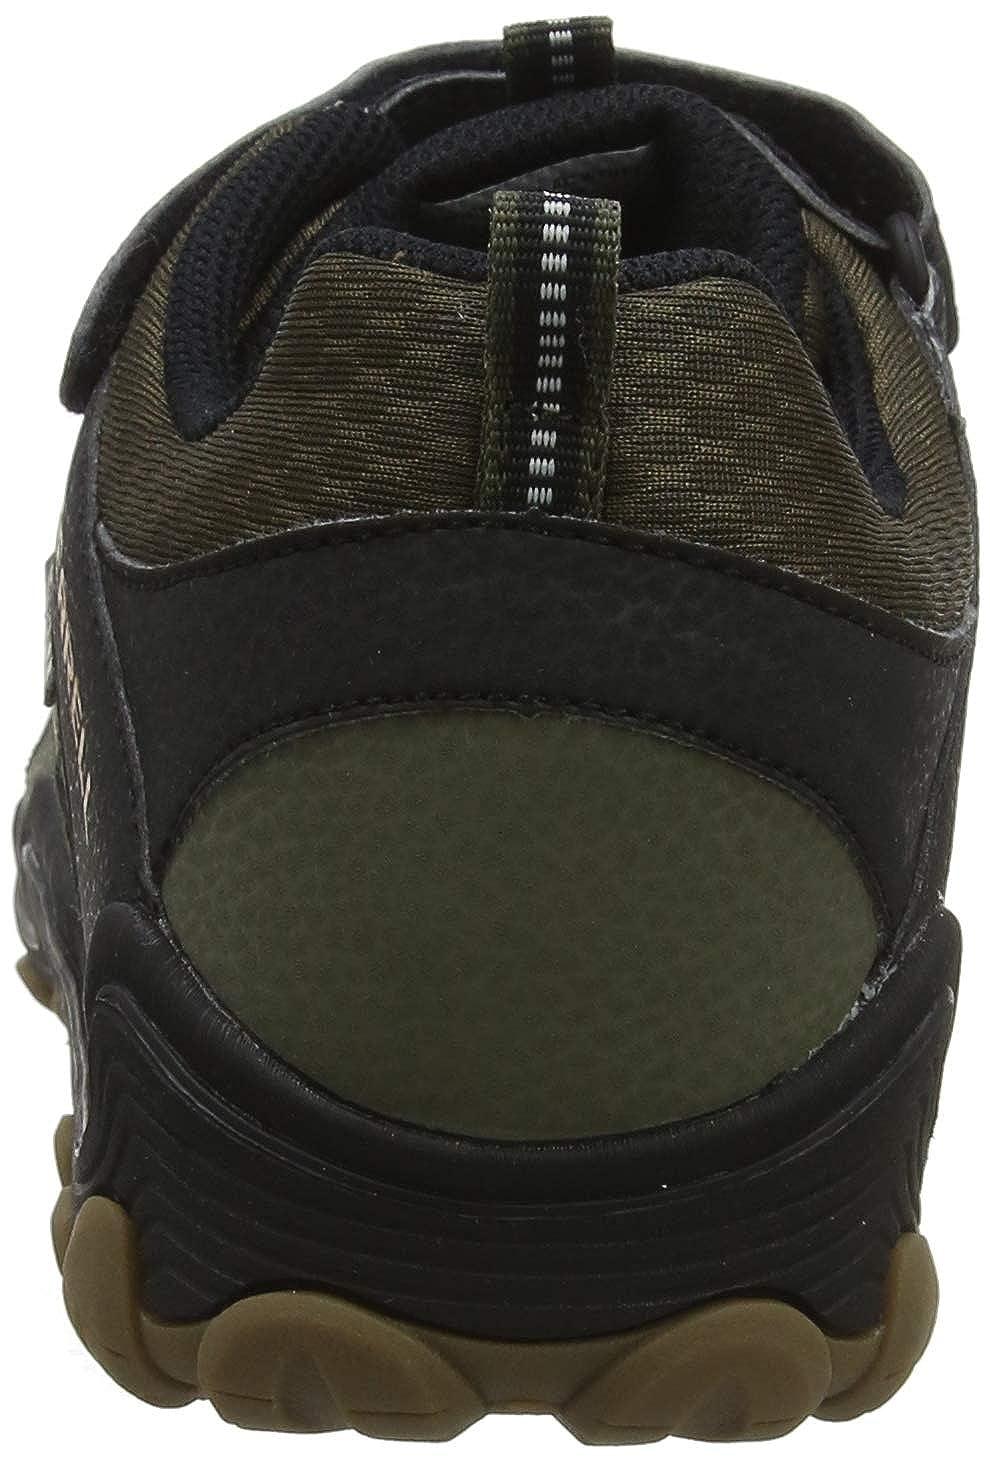 Zapatillas de Senderismo Unisex ni/ños Merrell M-Chameleon 7 Low A//C WTRPF